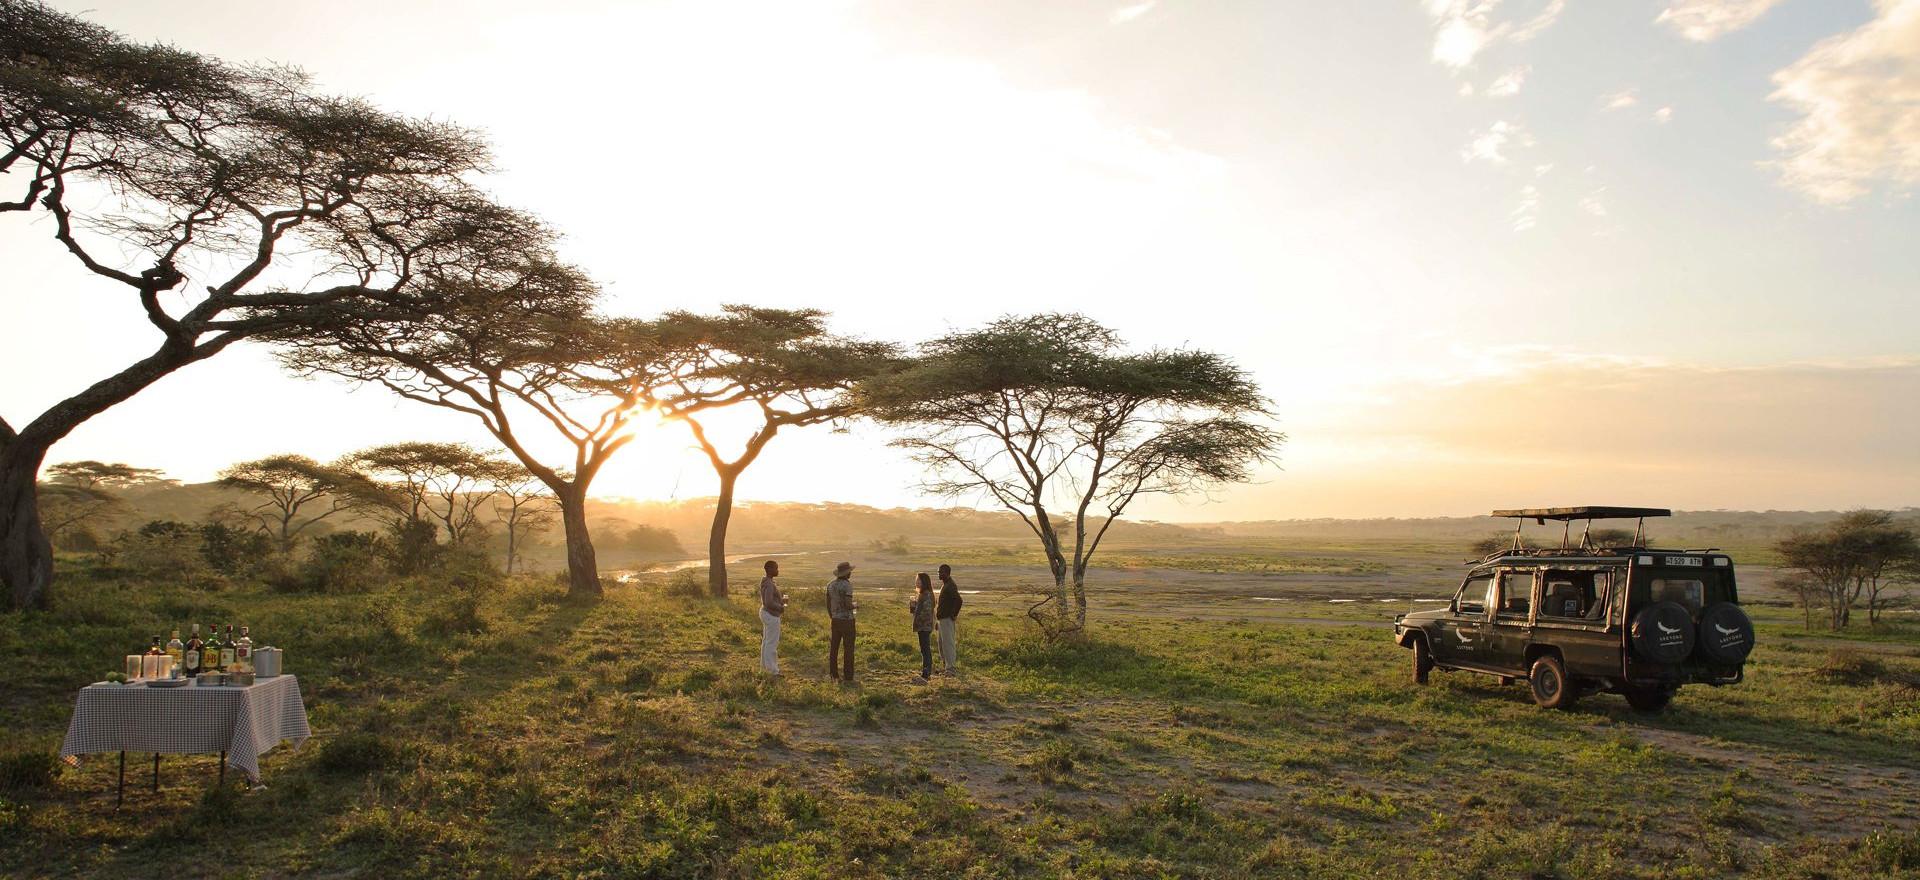 a-tanzania-luxury-safari-at-andbeyond-serengeti-under-canvas-fly-me-around-east-africa.jpg